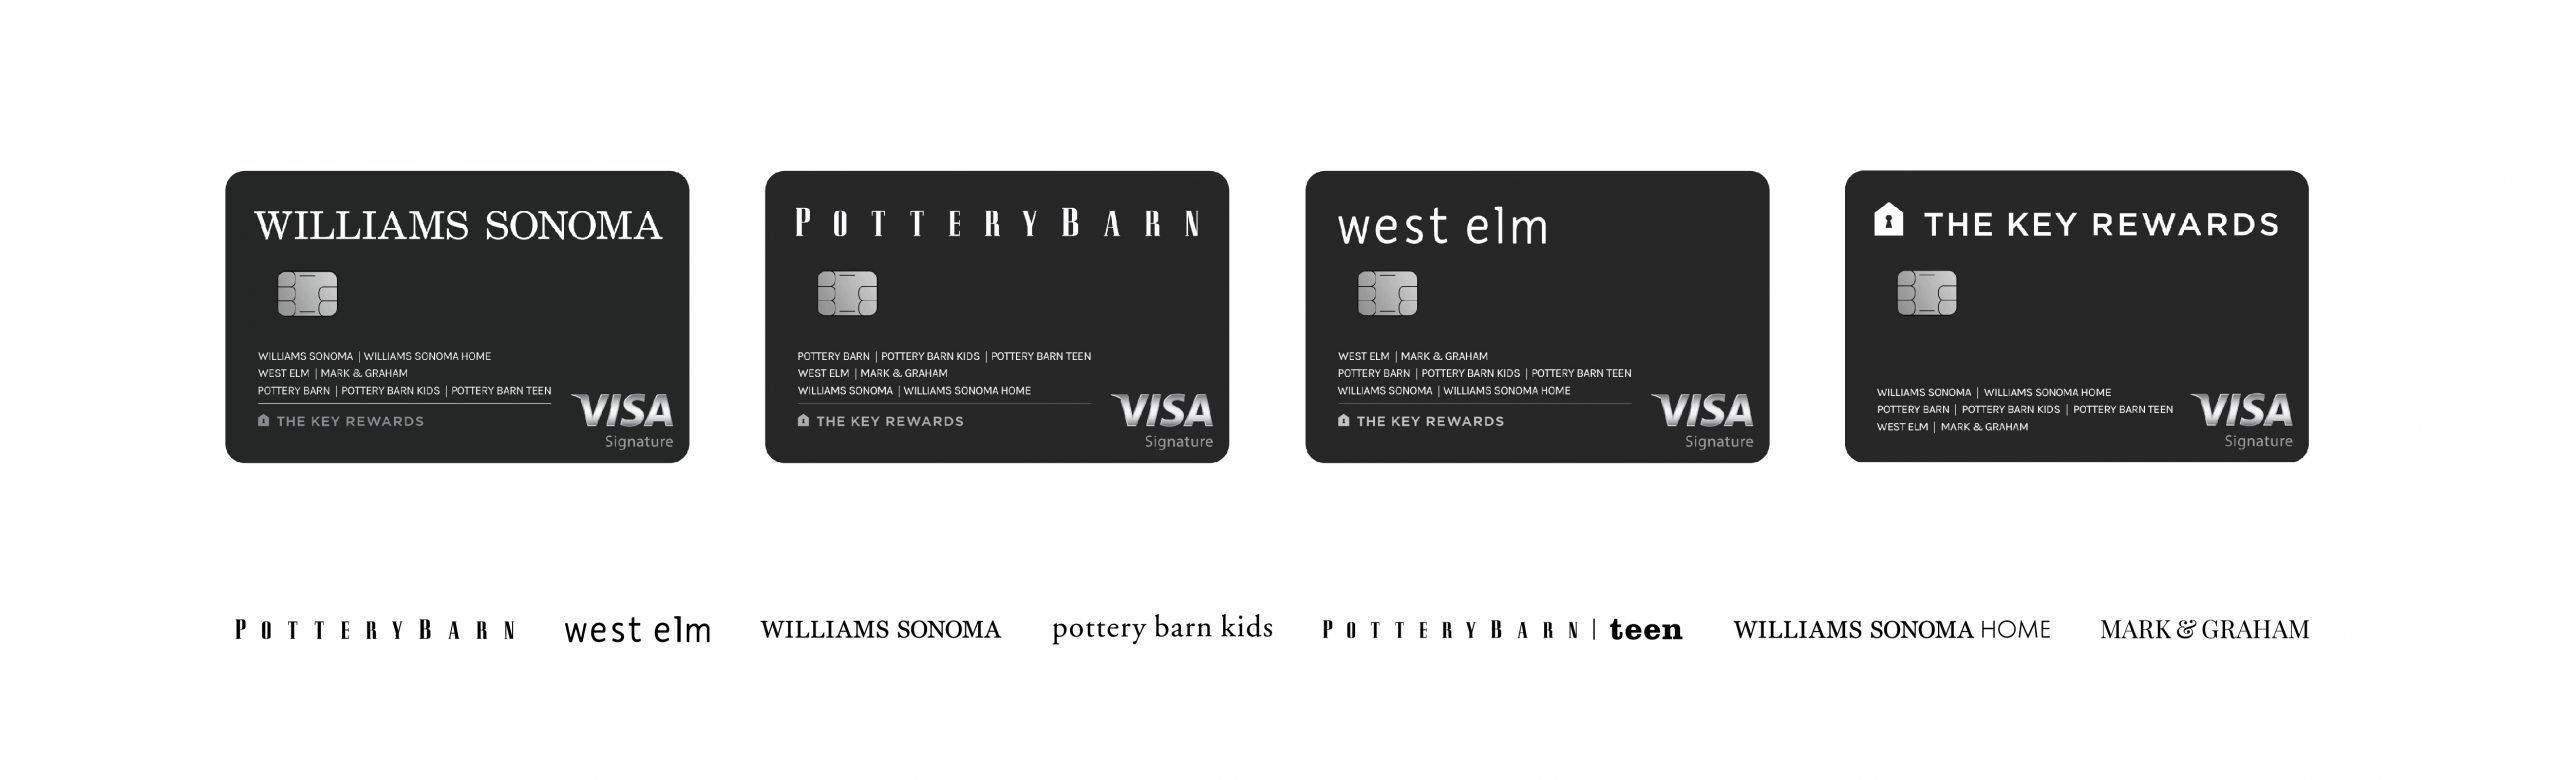 key rewards visa card designs